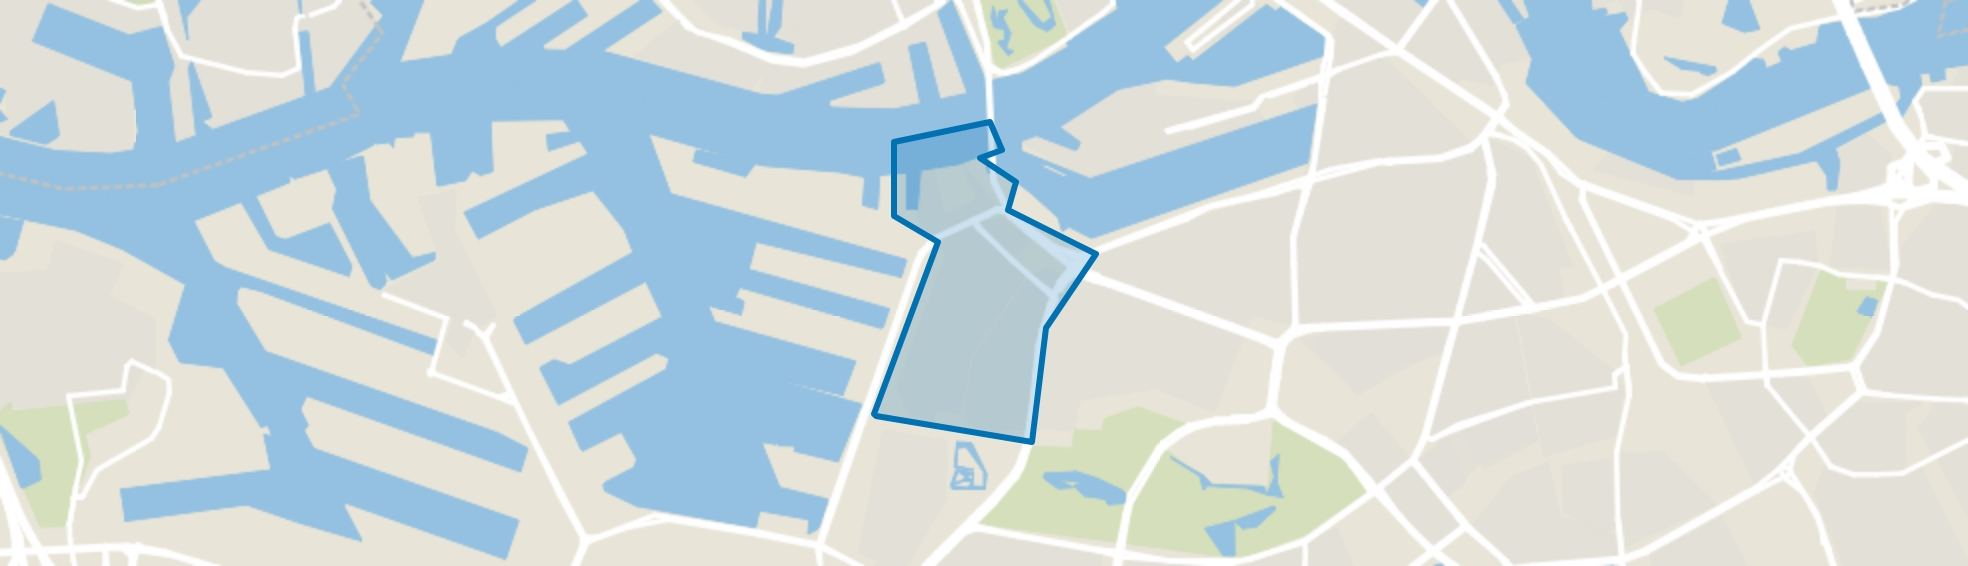 Oud Charlois, Rotterdam map